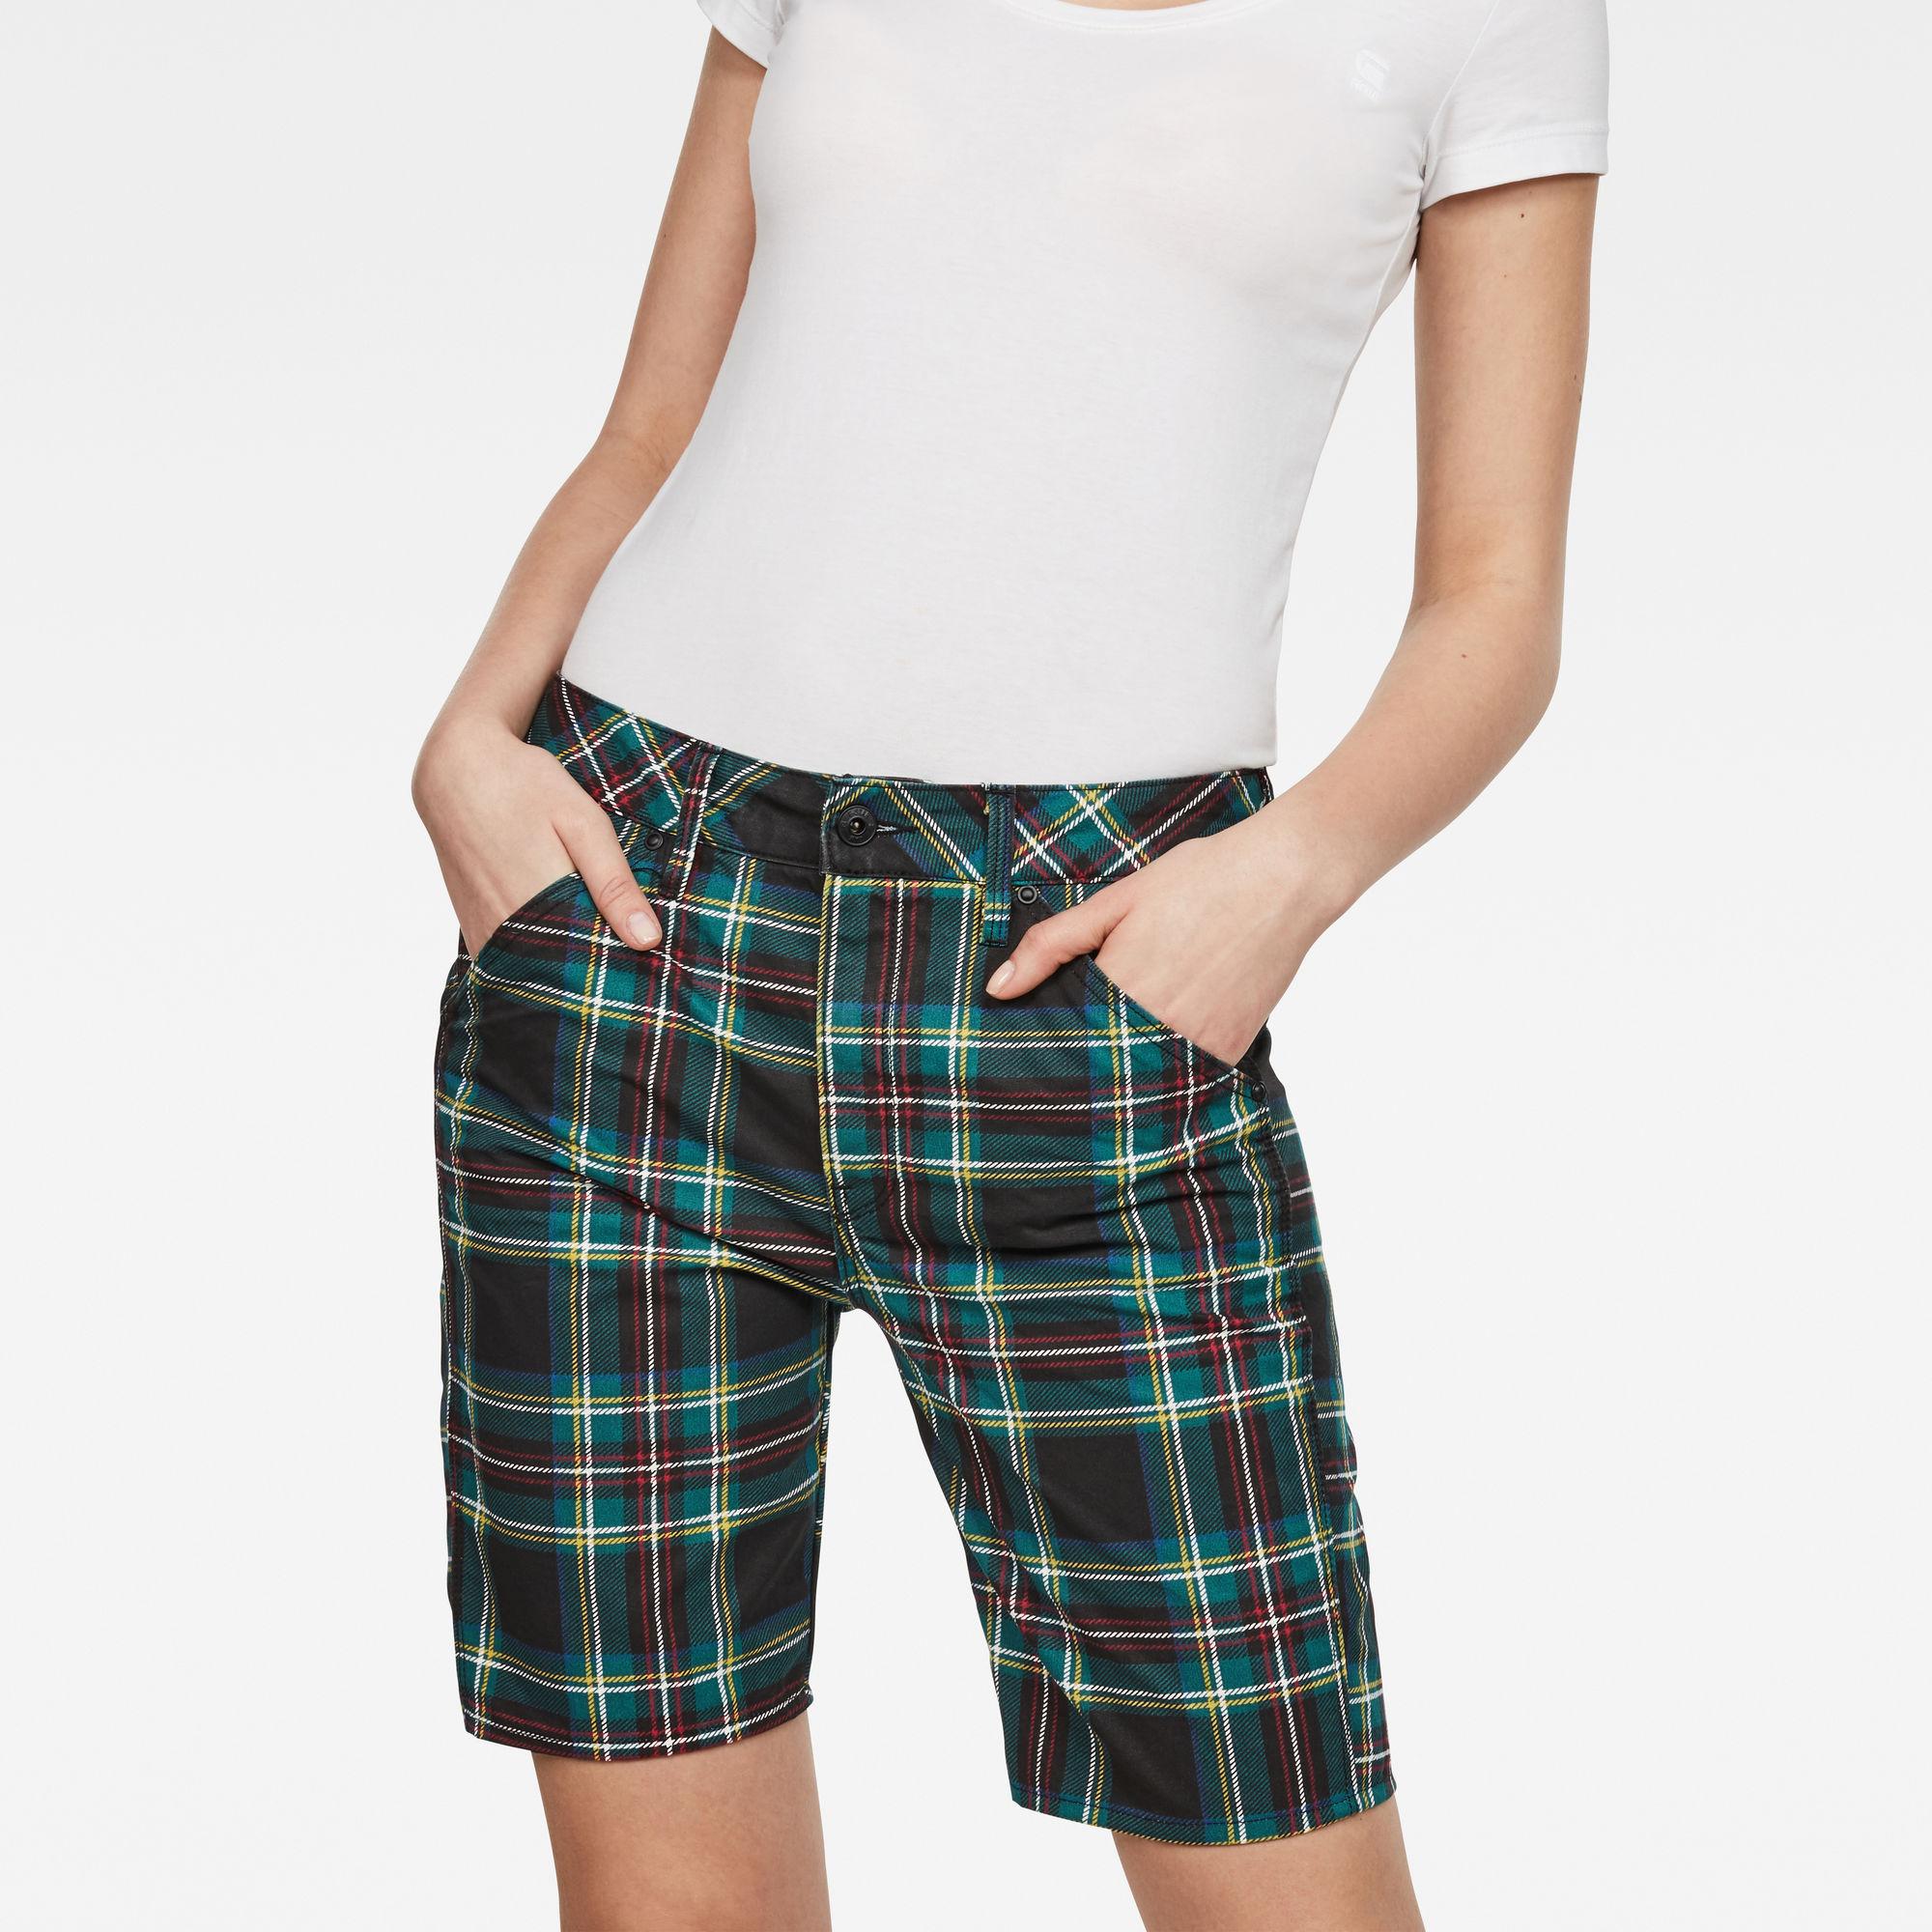 Image of G Star Raw 5621 Boyfriend Women's Shorts